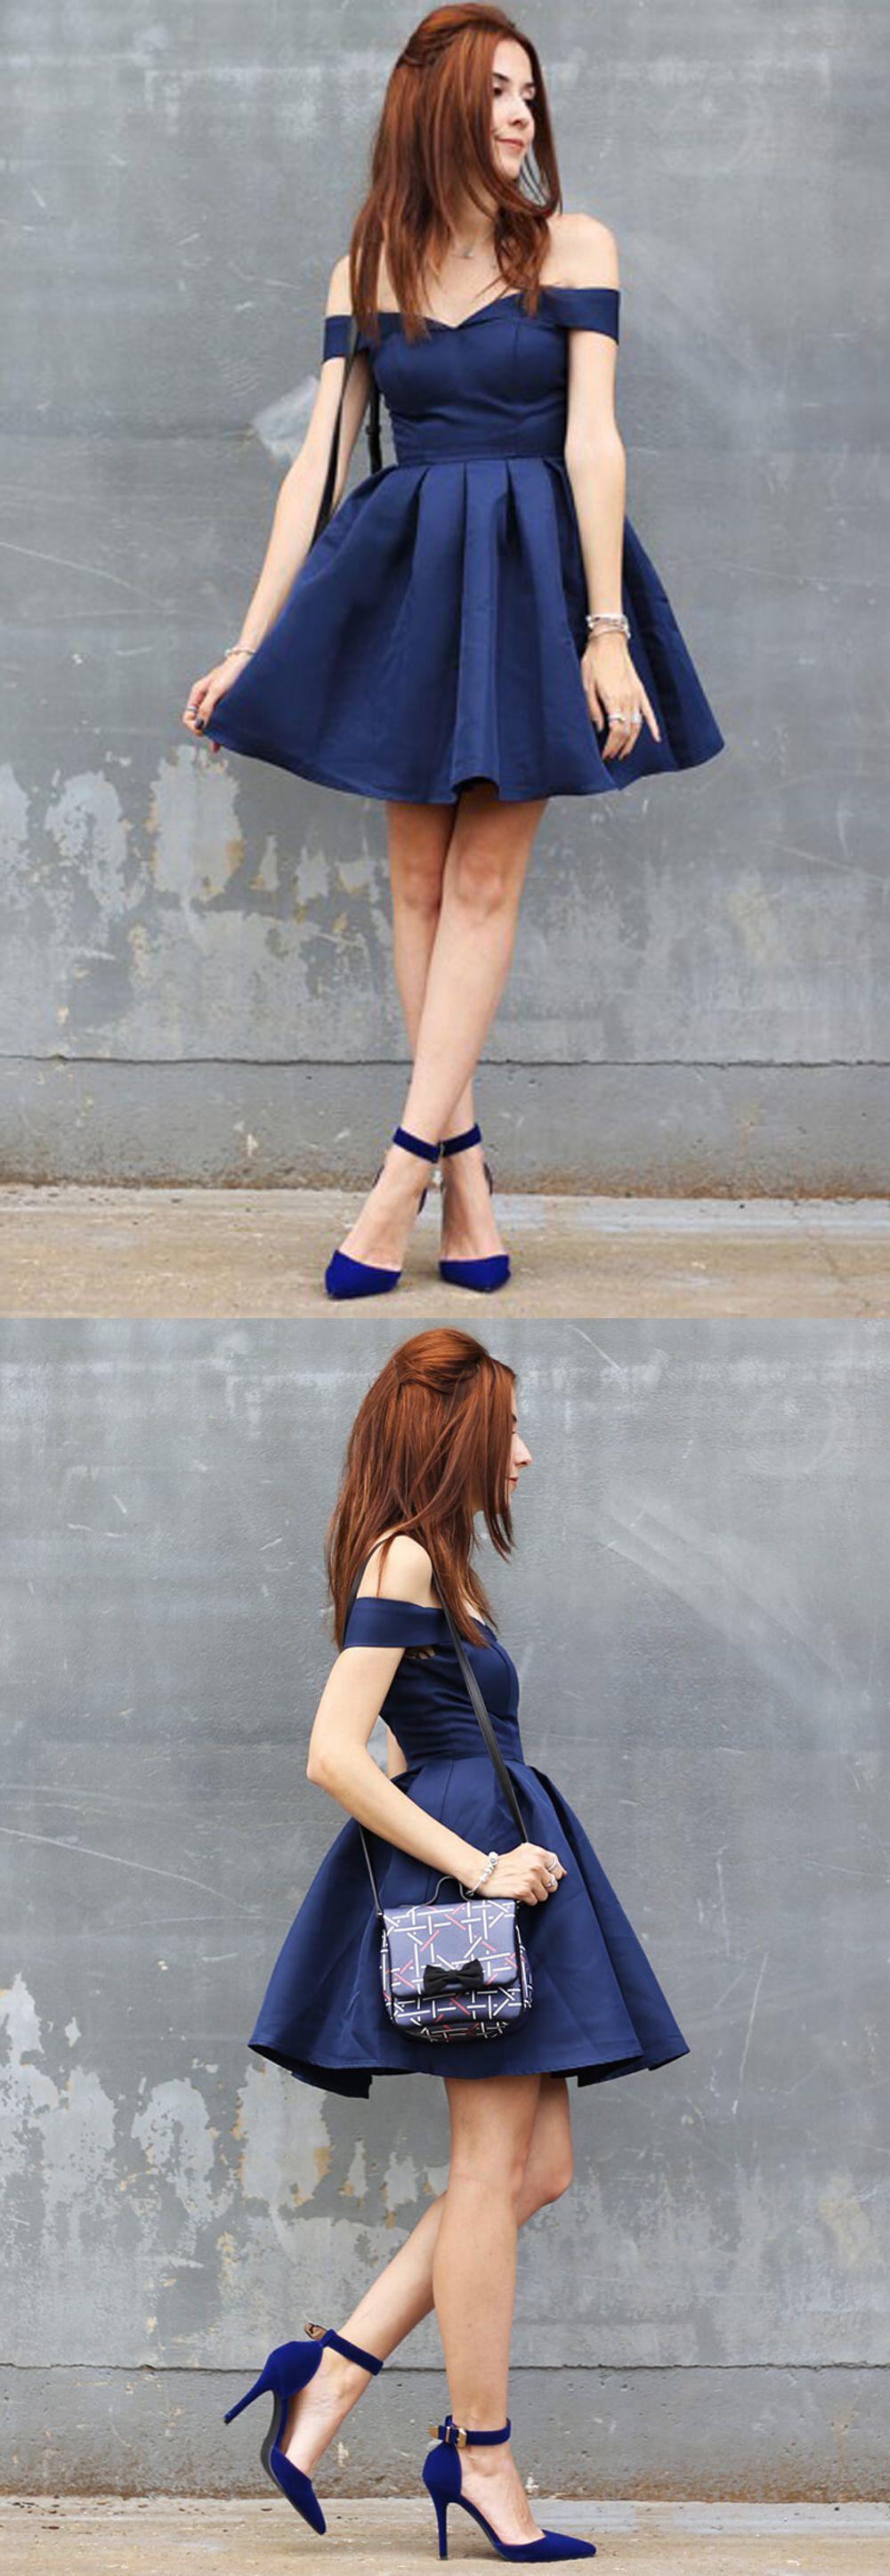 Aline offtheshoulder short navy blue homecoming dress prom